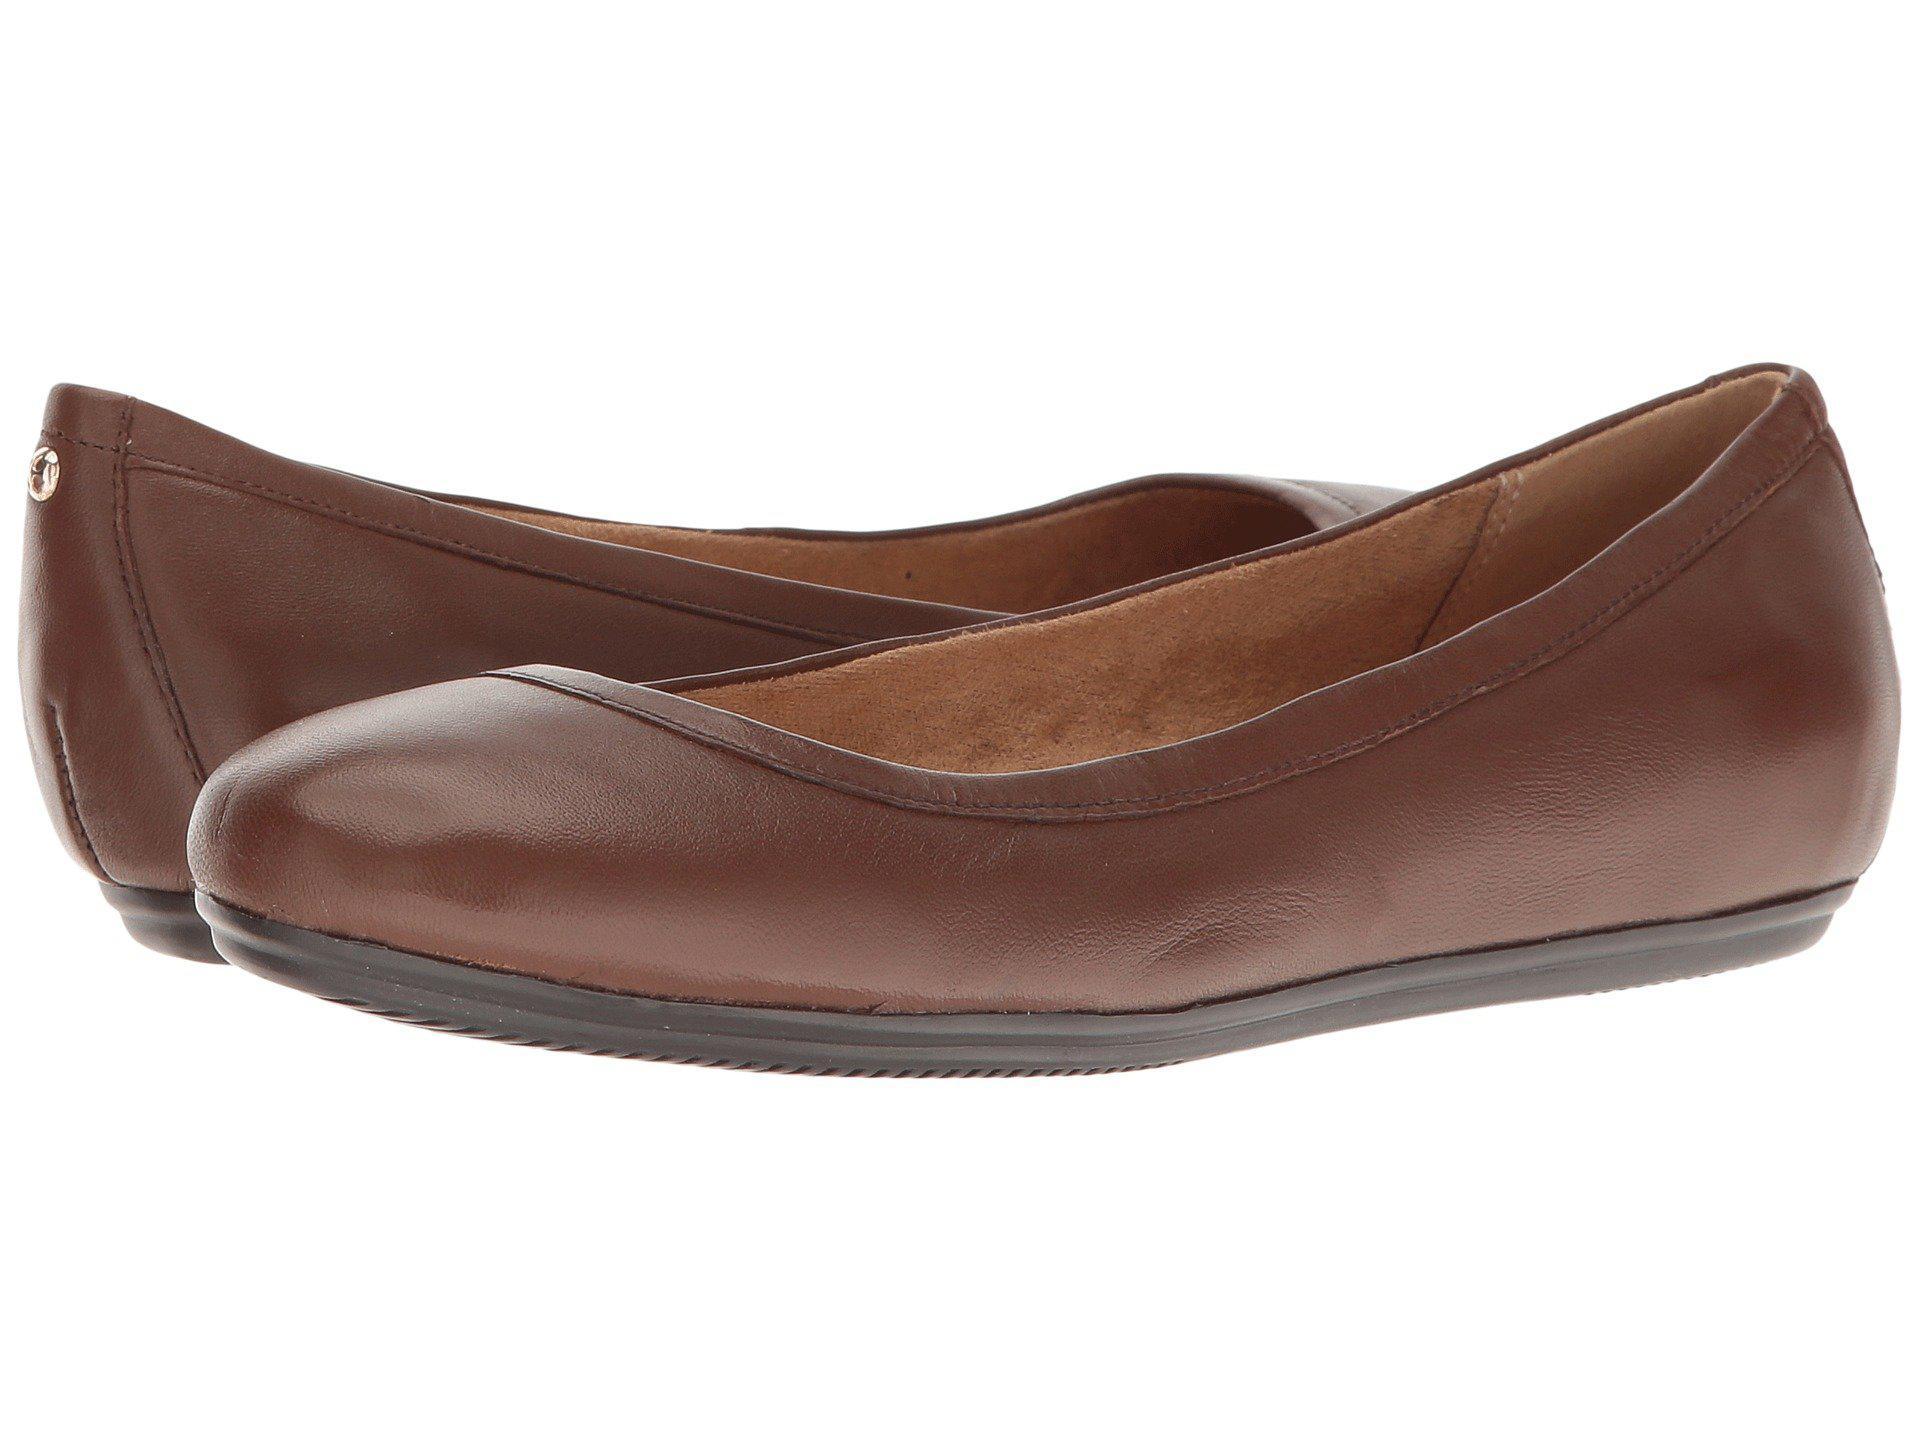 e83e0e0fe06b Lyst - Naturalizer Brittany (black Suede) Women s Flat Shoes in ...